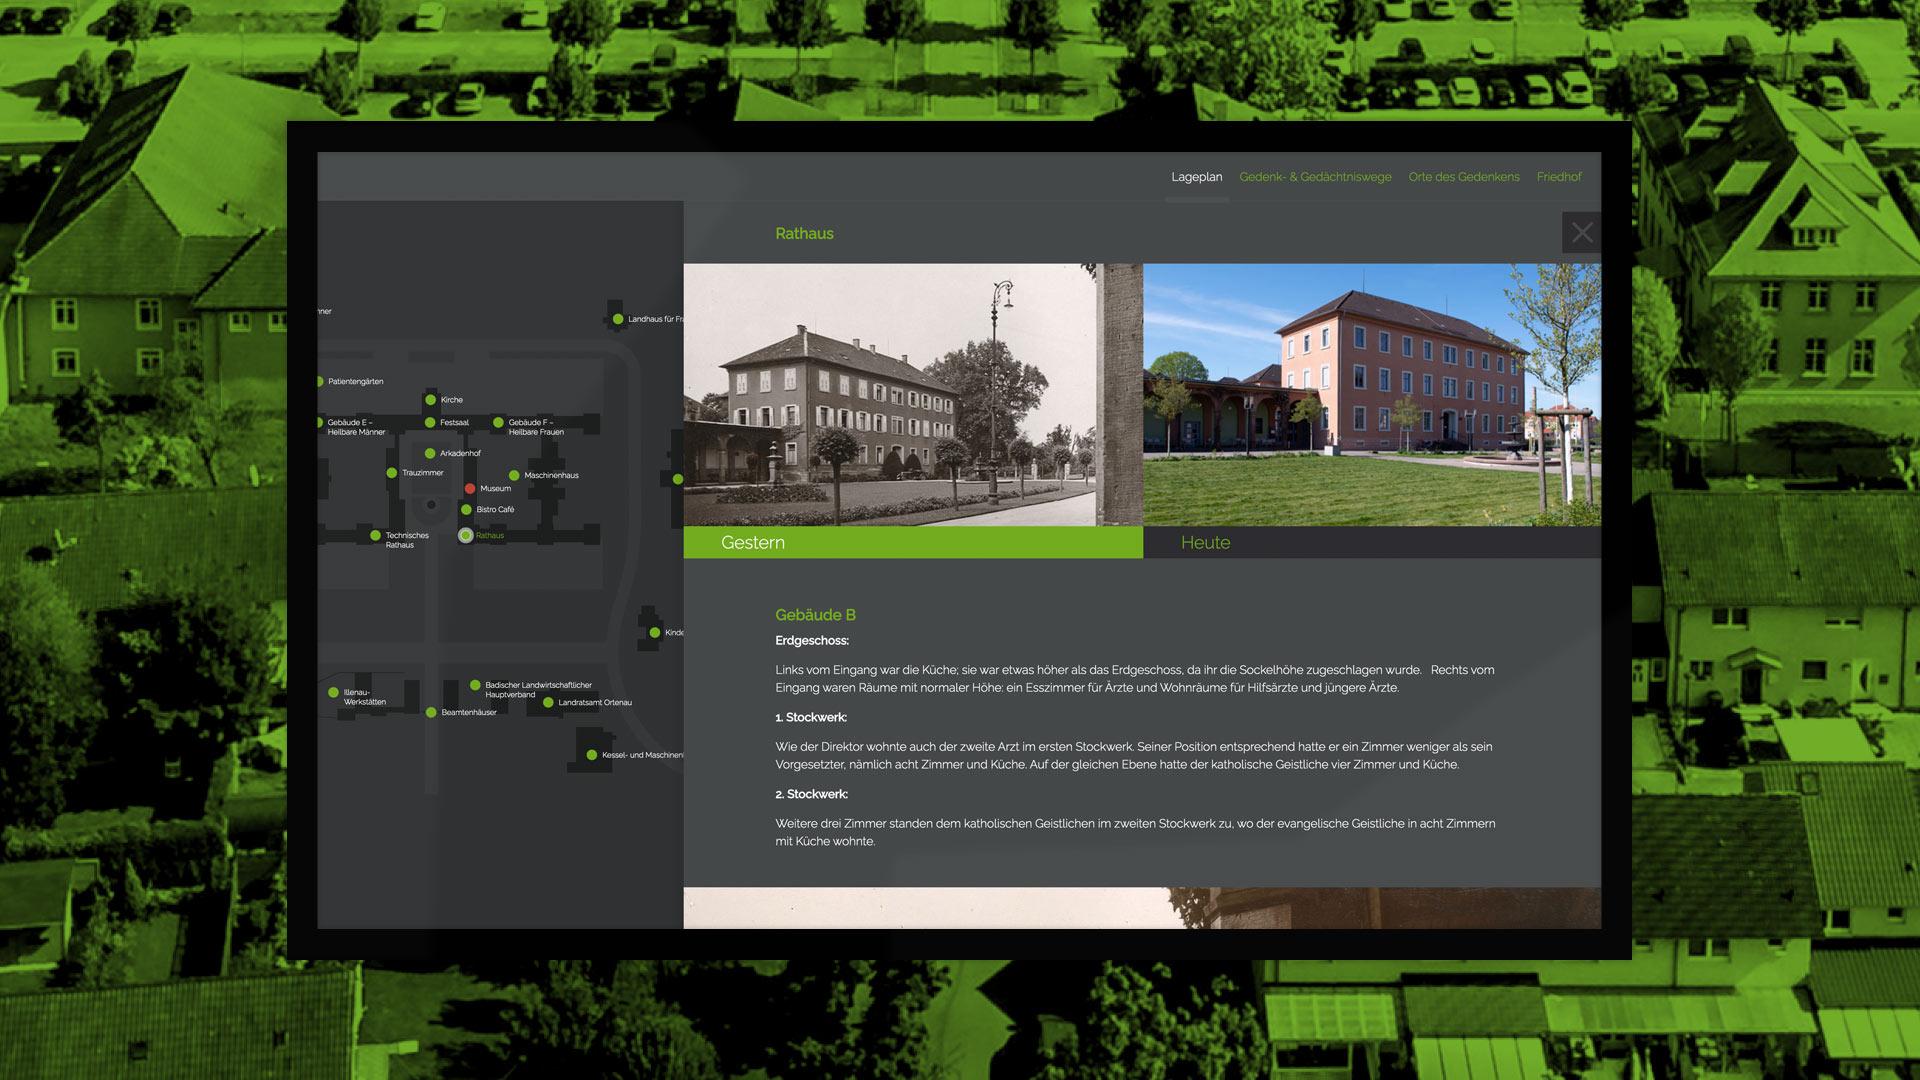 Illenau Arkaden Museum, Achern – Multimedia